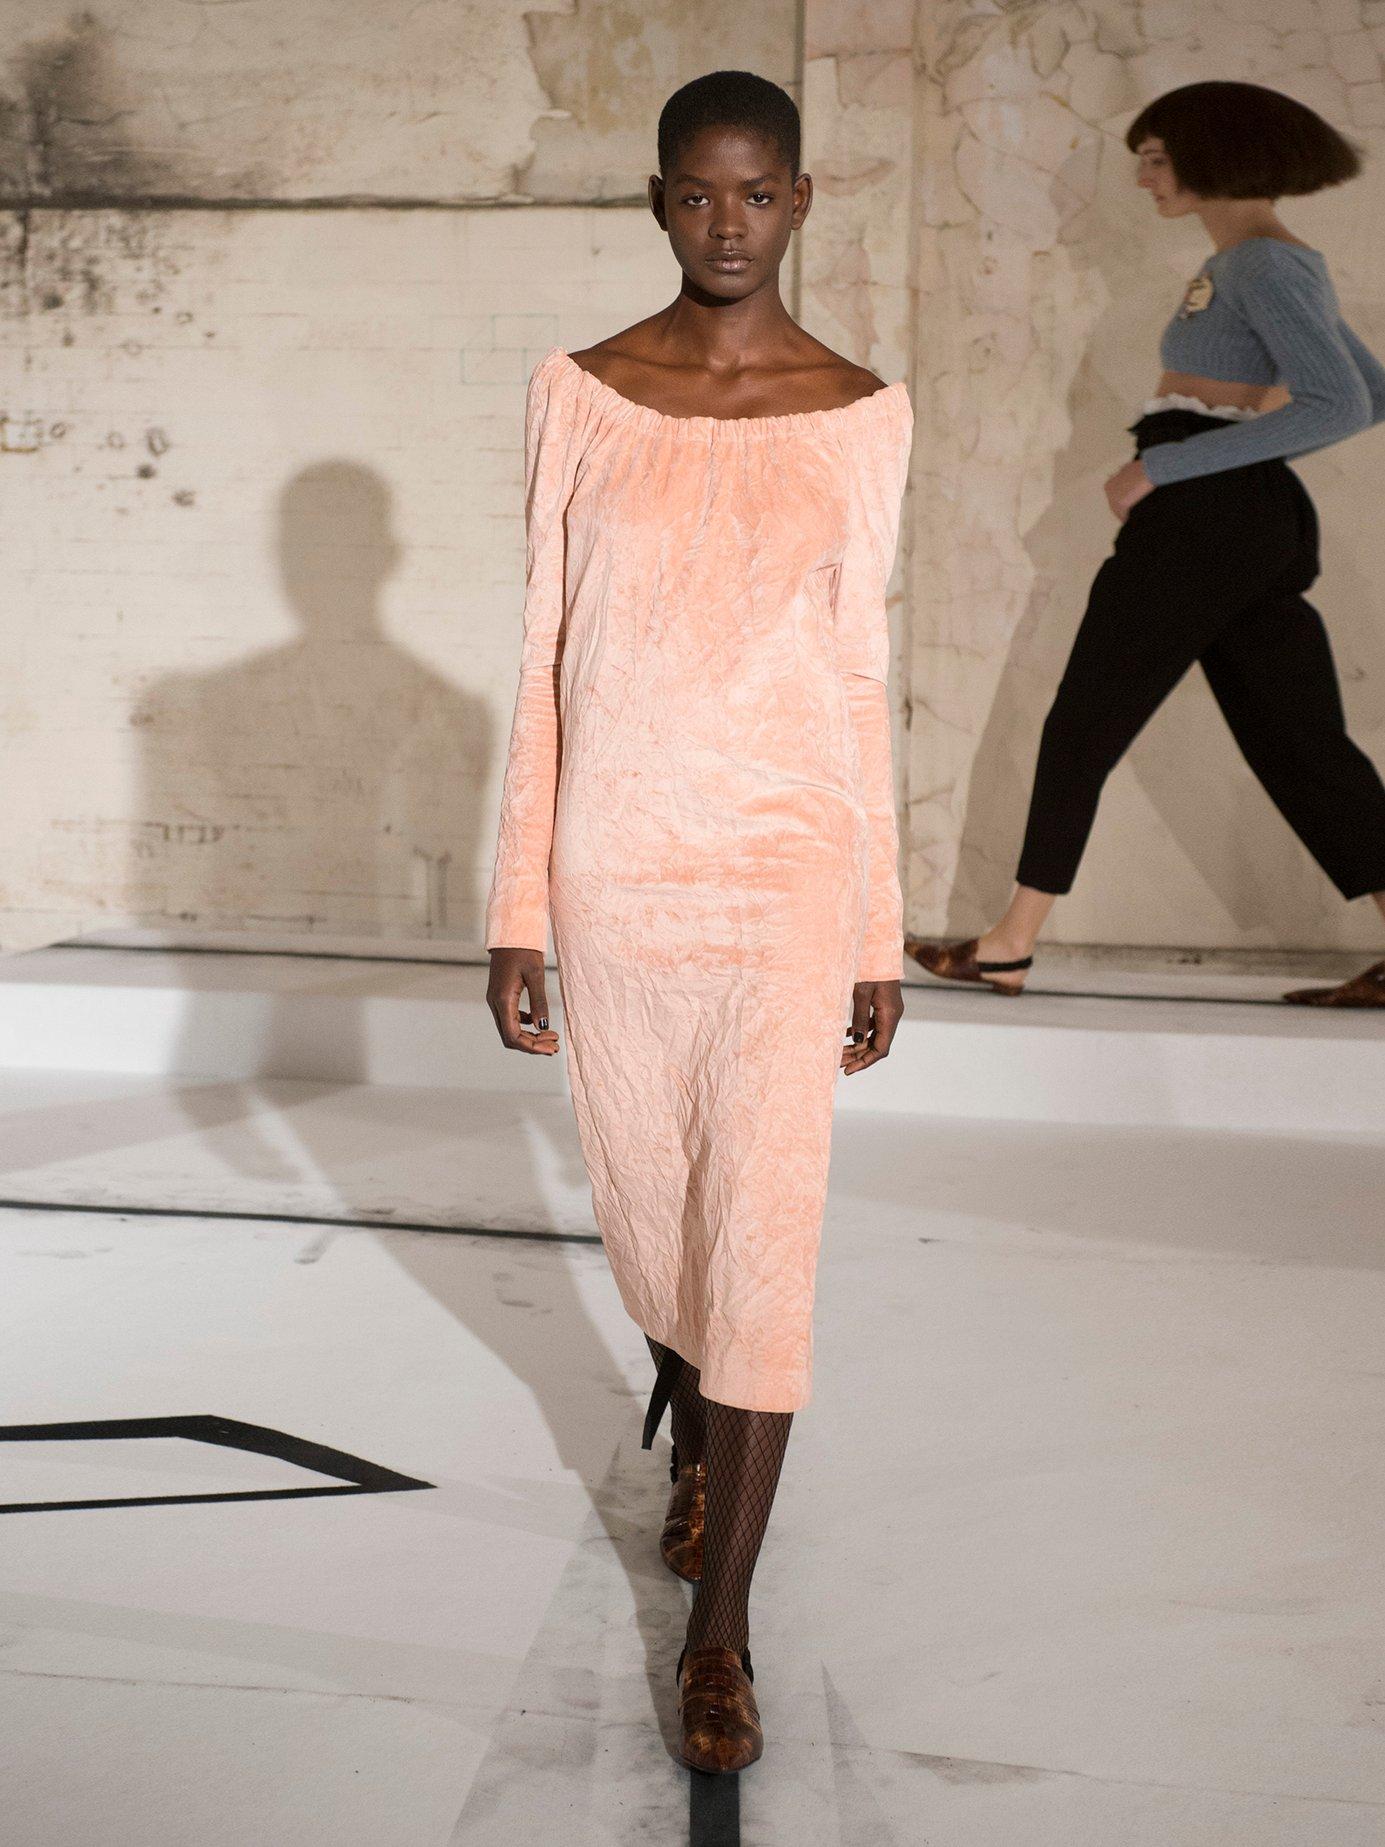 La Femme crushed-velvet dress by Isa Arfen